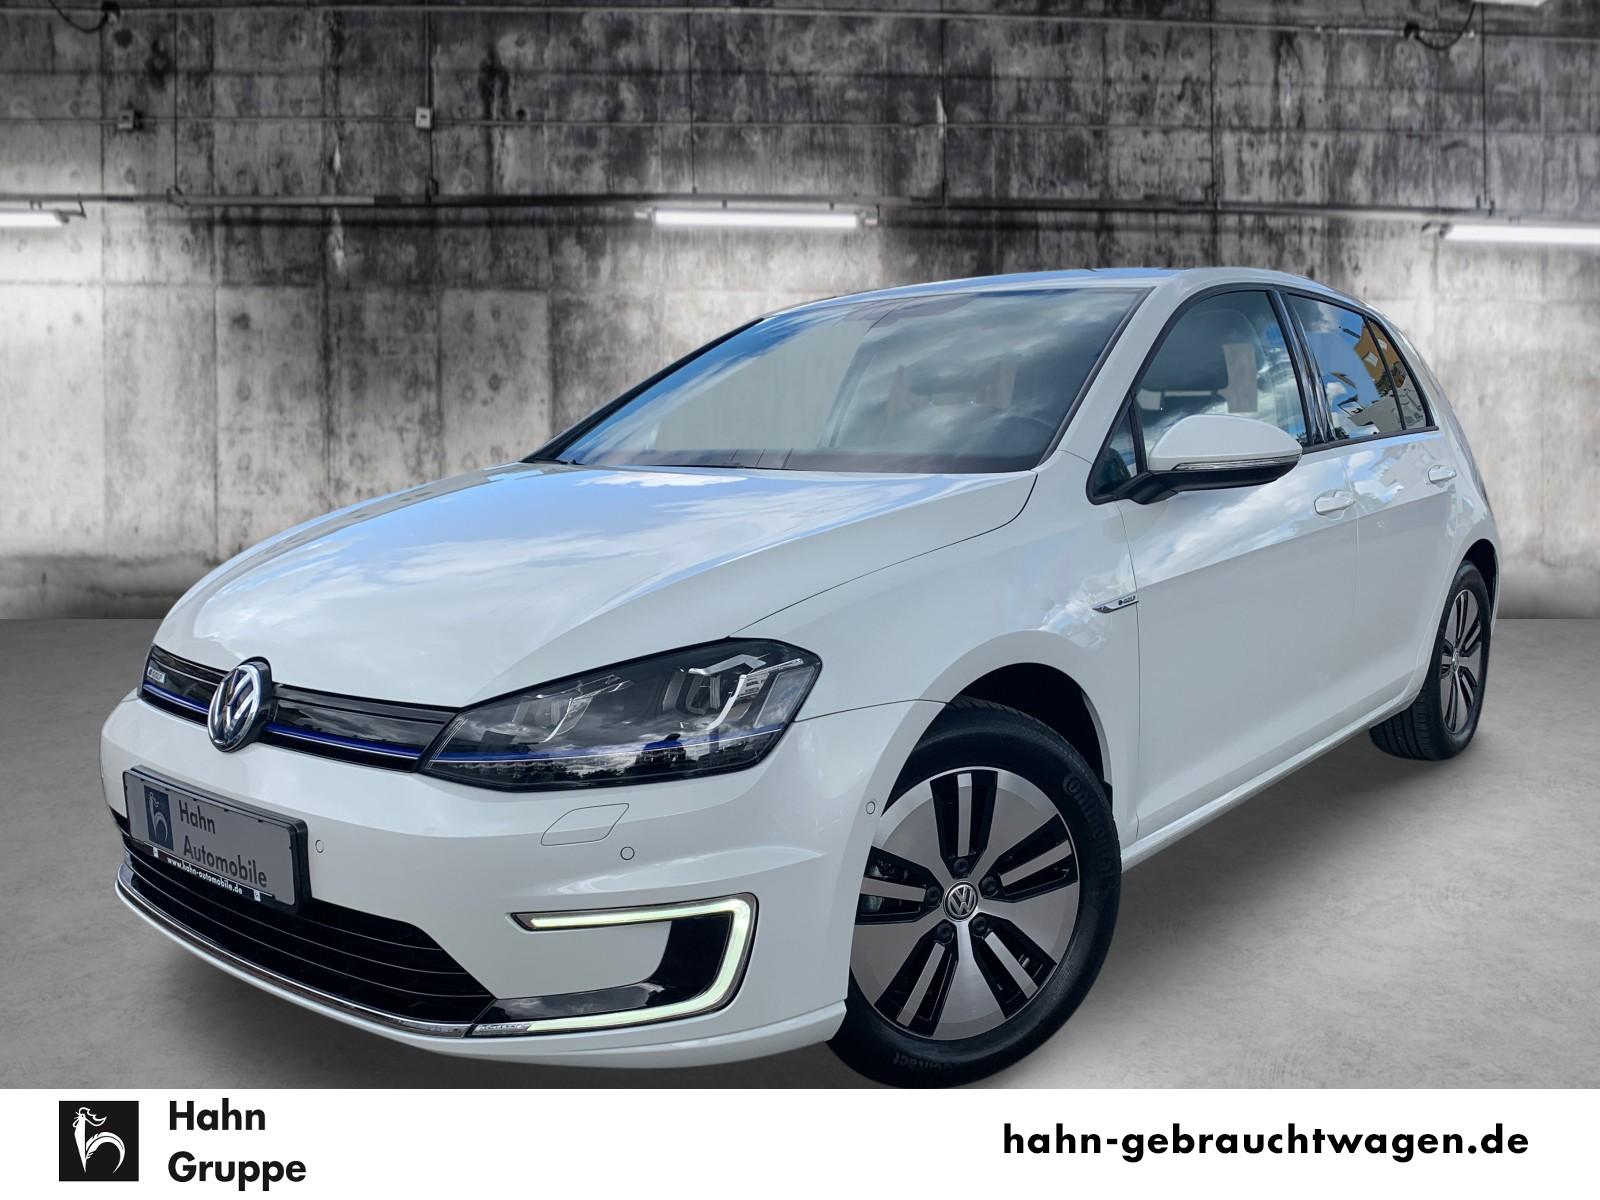 Volkswagen Golf VII e-Golf Comfortline LED Navi Sitzh PDC, Jahr 2016, Elektro